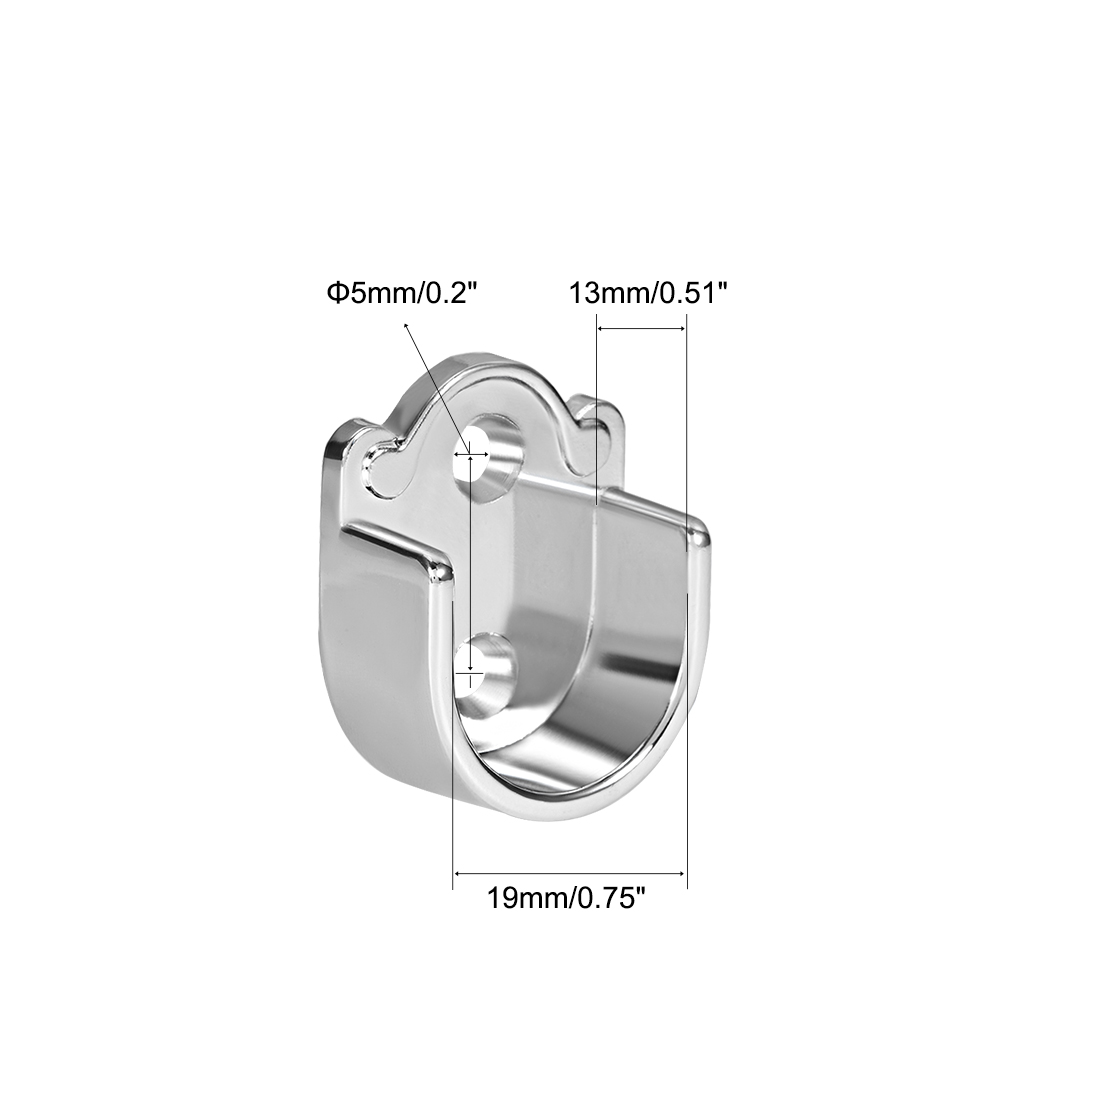 Wardrobe Rod Flange Bracket Support Fit Rod Dia 22mm 4 PCS uxcell Zinc Alloy Oval Closet Rod End Supports